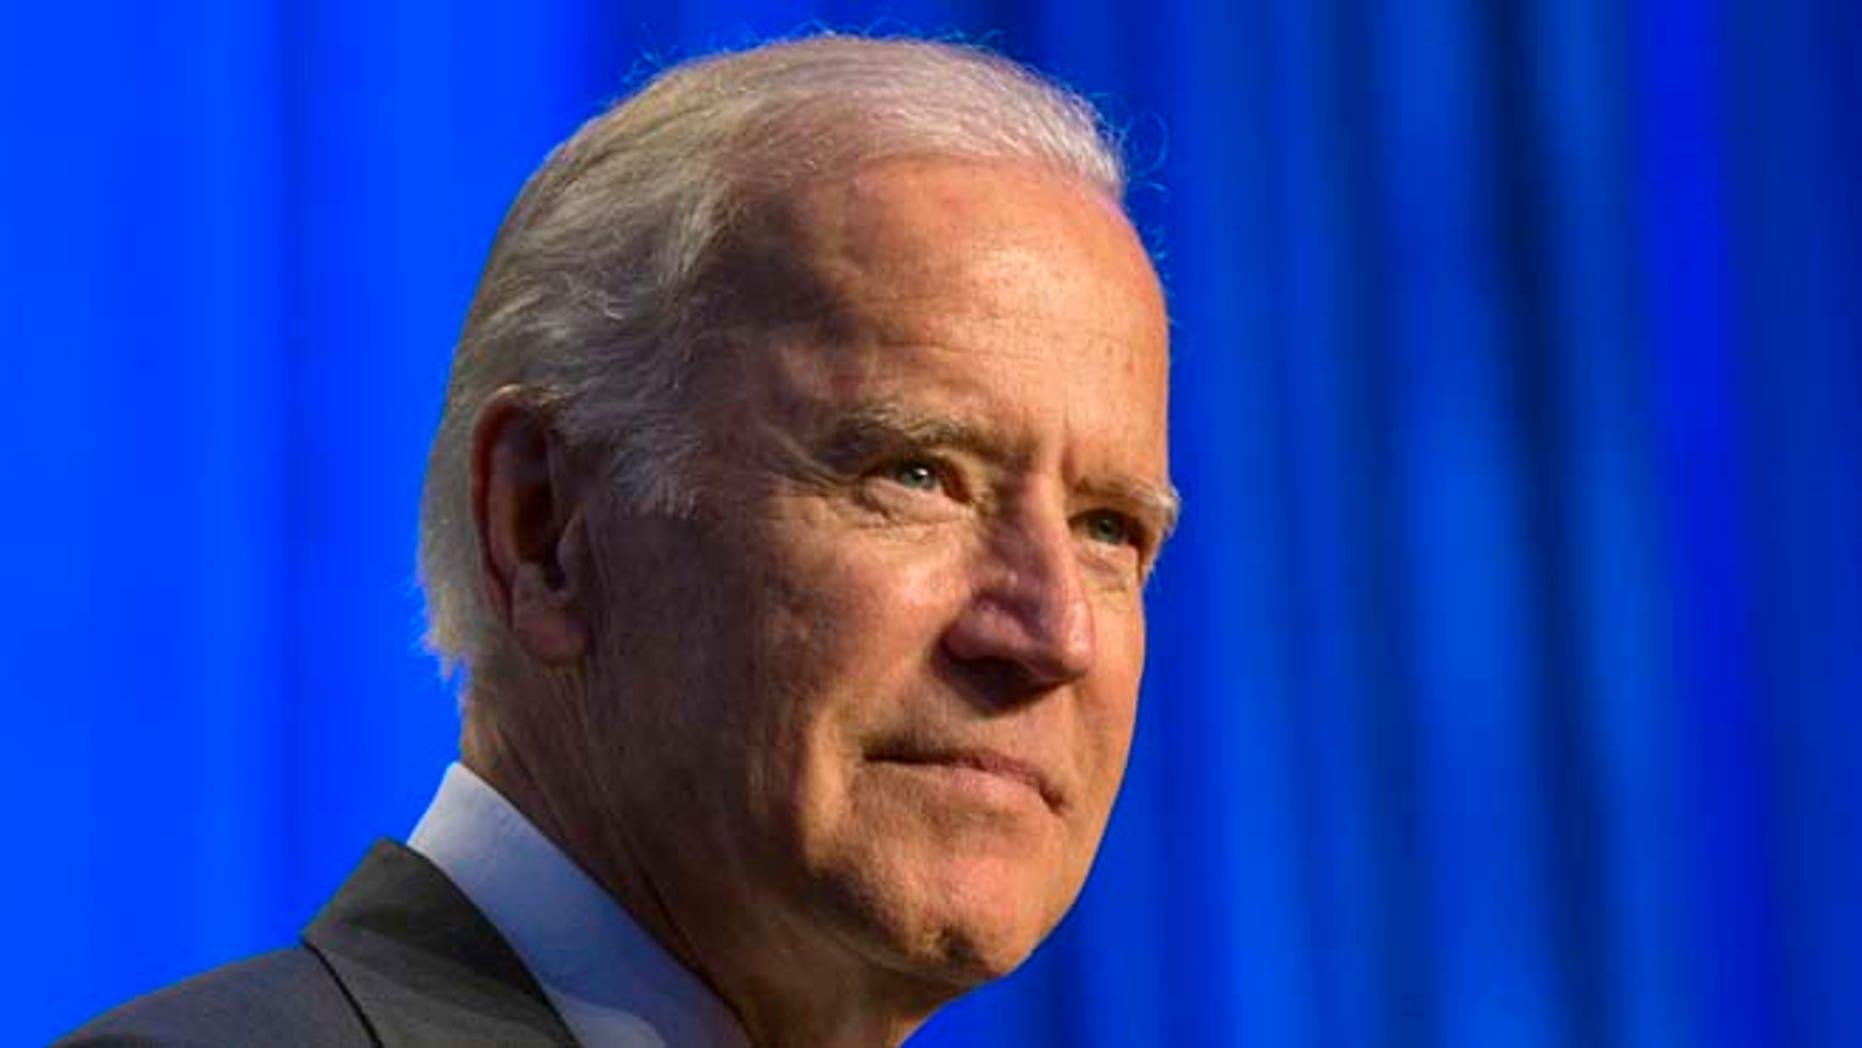 July 16, 2015: Vice President Joe Biden speaks at Generation Progressâs 10th Annual Make Progress National Summit.